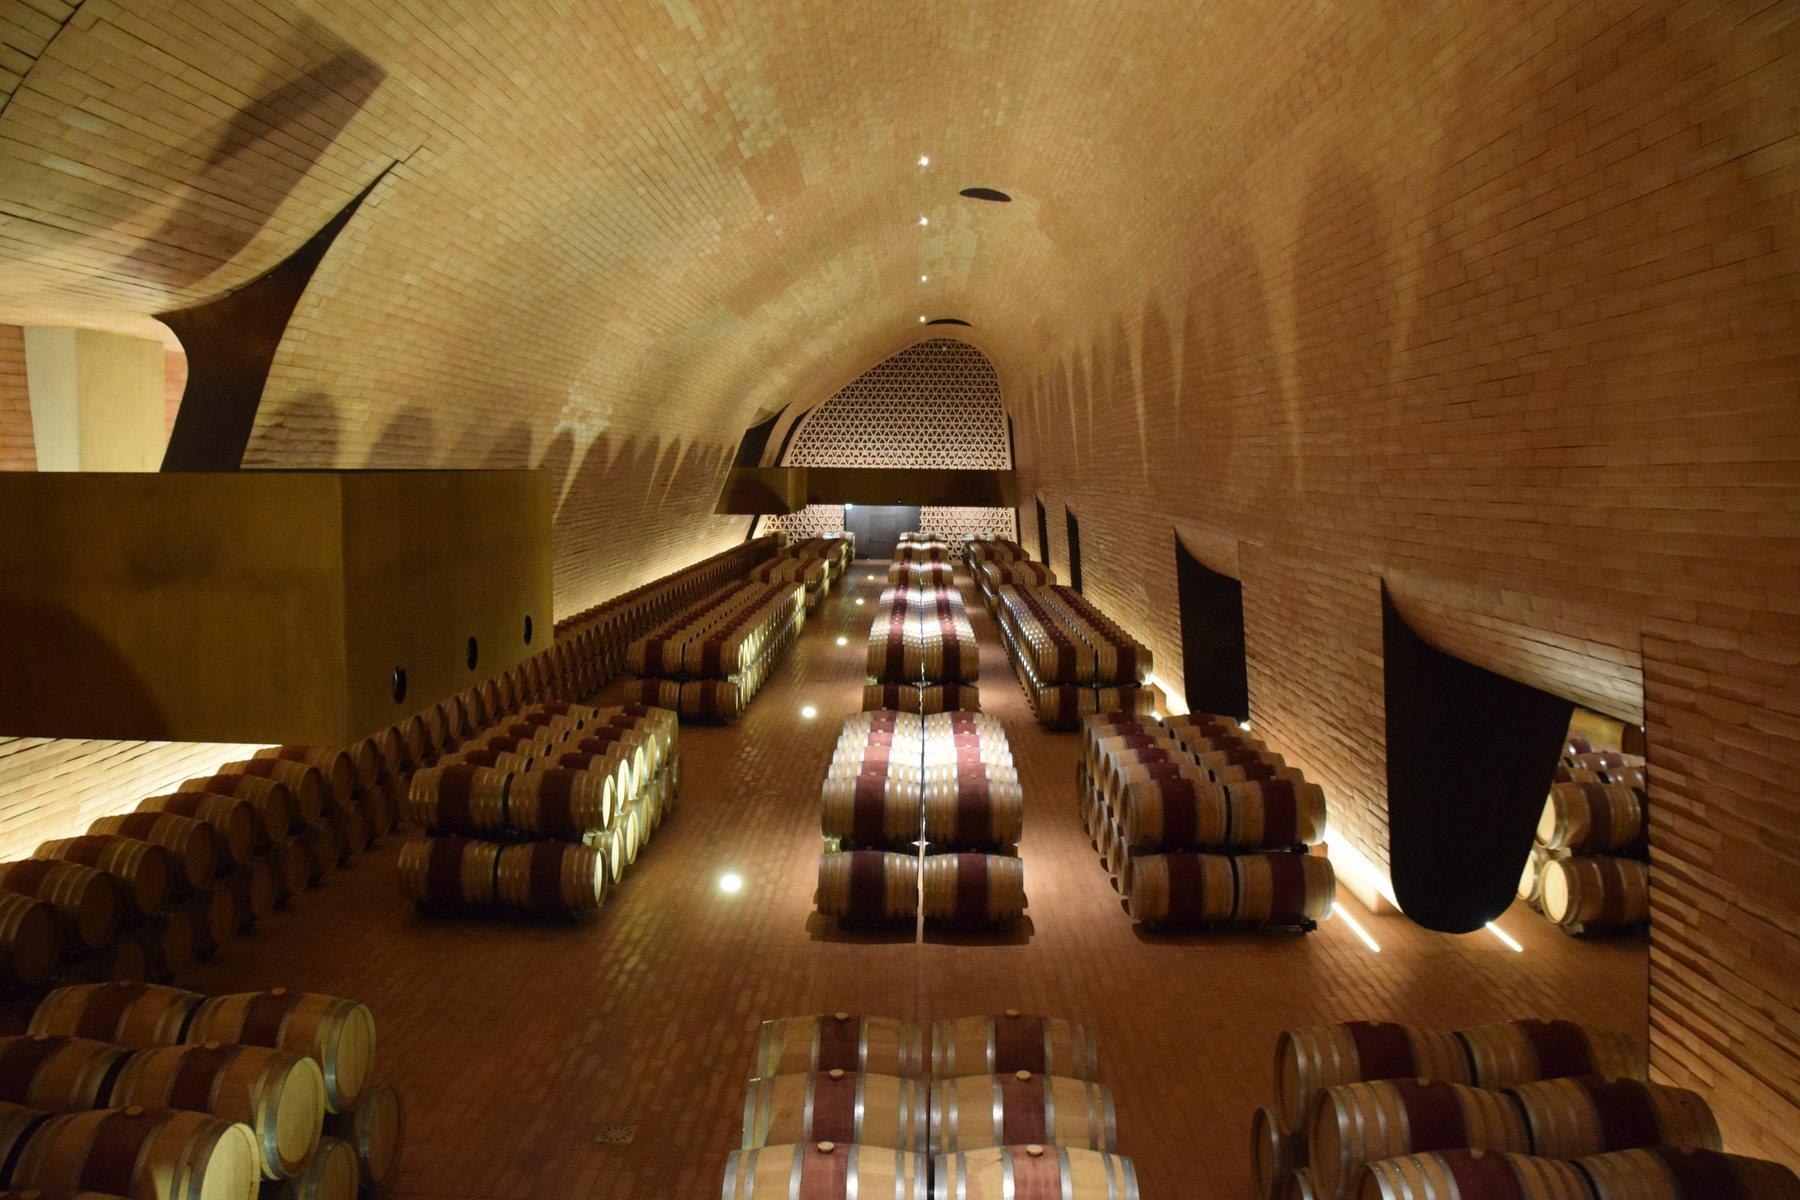 Antinori cellar in Italy